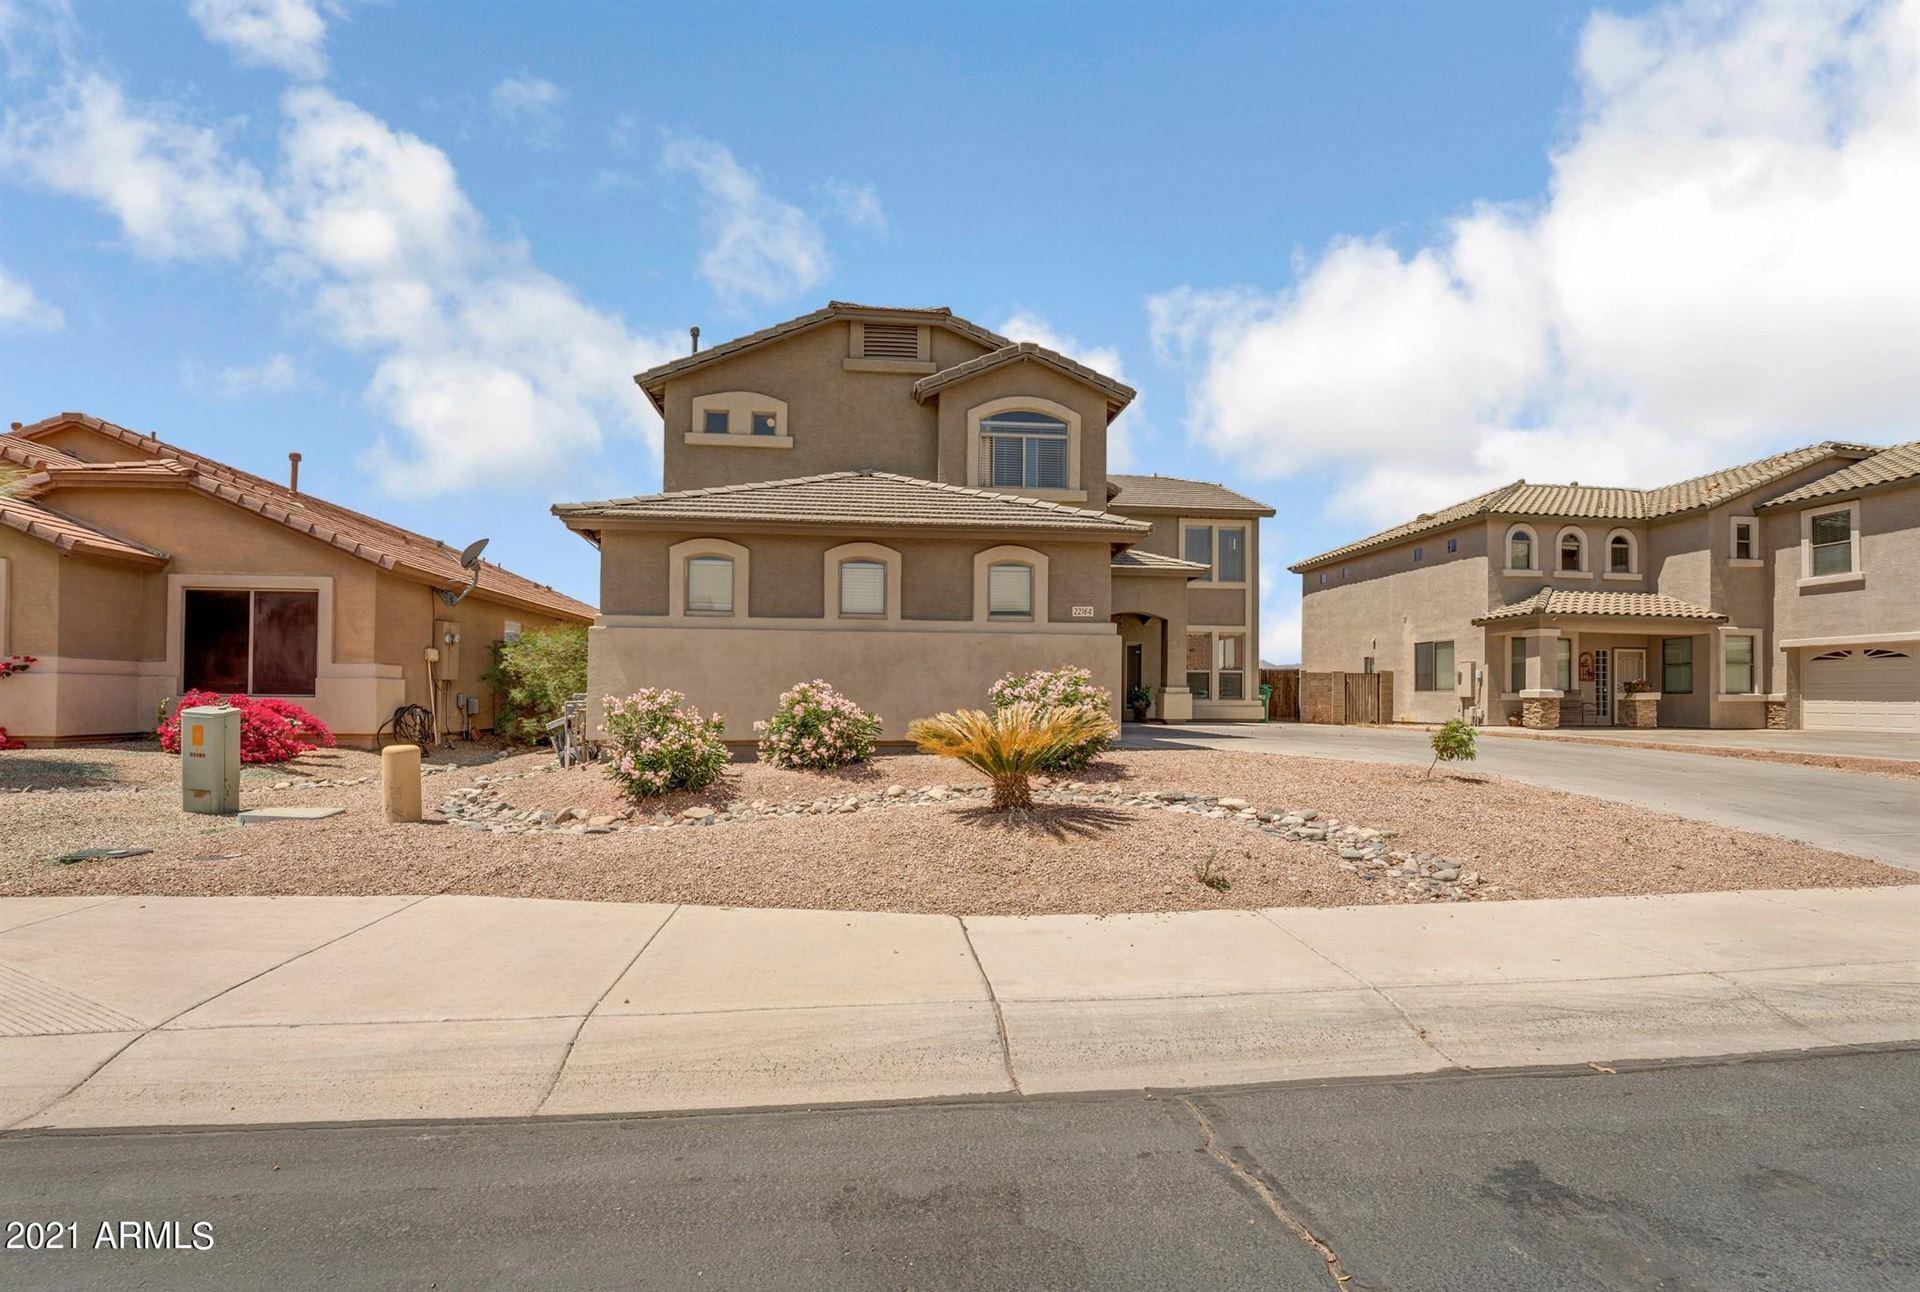 Photo for 22164 N VARGAS Drive, Maricopa, AZ 85138 (MLS # 6225852)